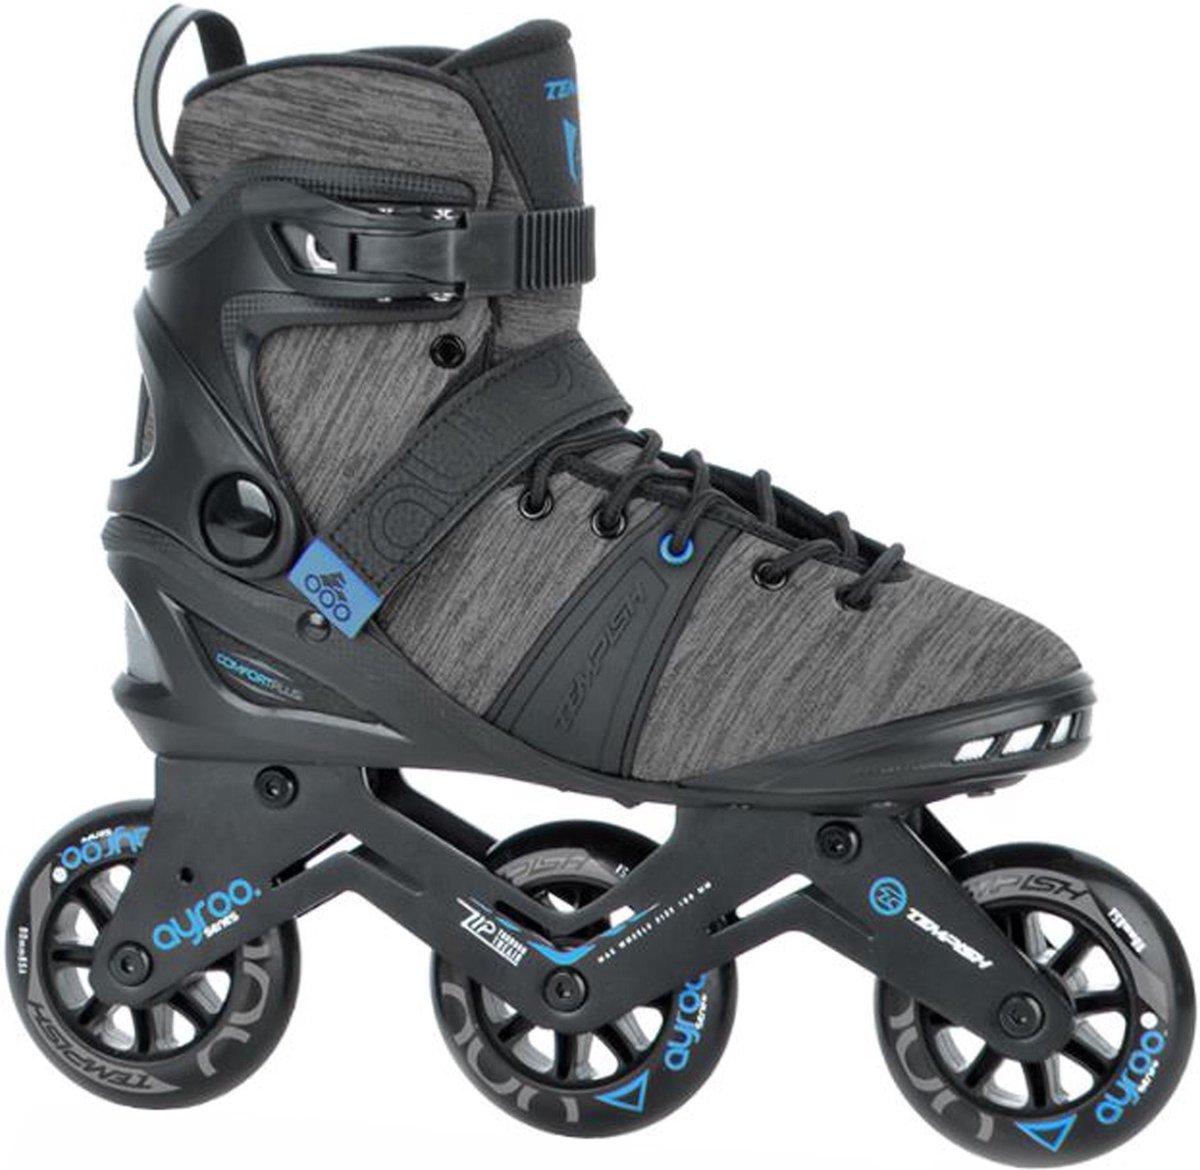 Tempish Ayroo 90 Inlineskates - Maat 42 - Unisex - zwart - grijs - blauw